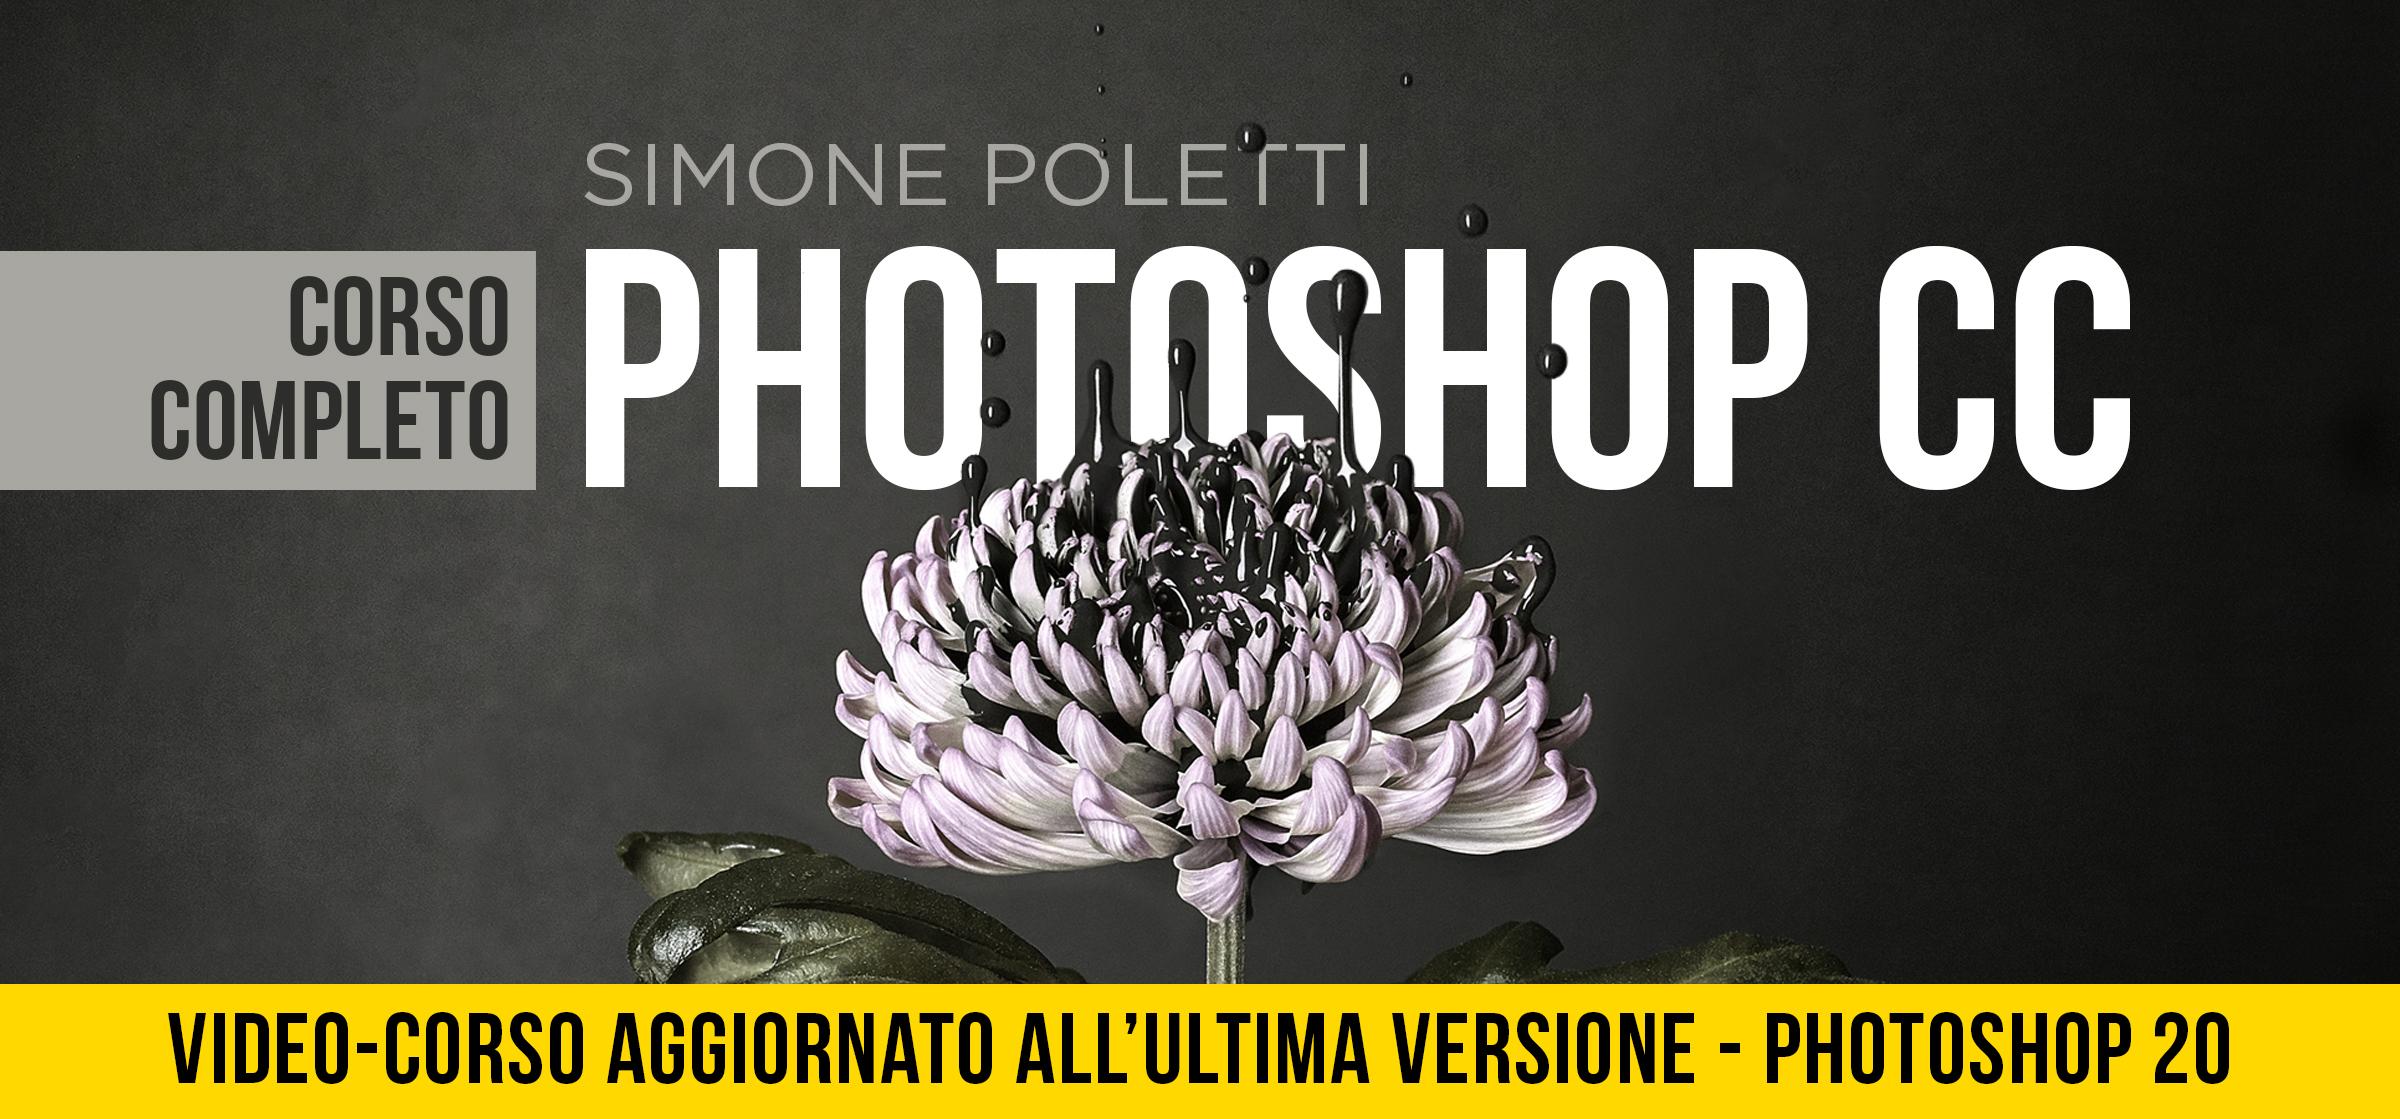 Photoshop CC2018: la recensione del videocorso